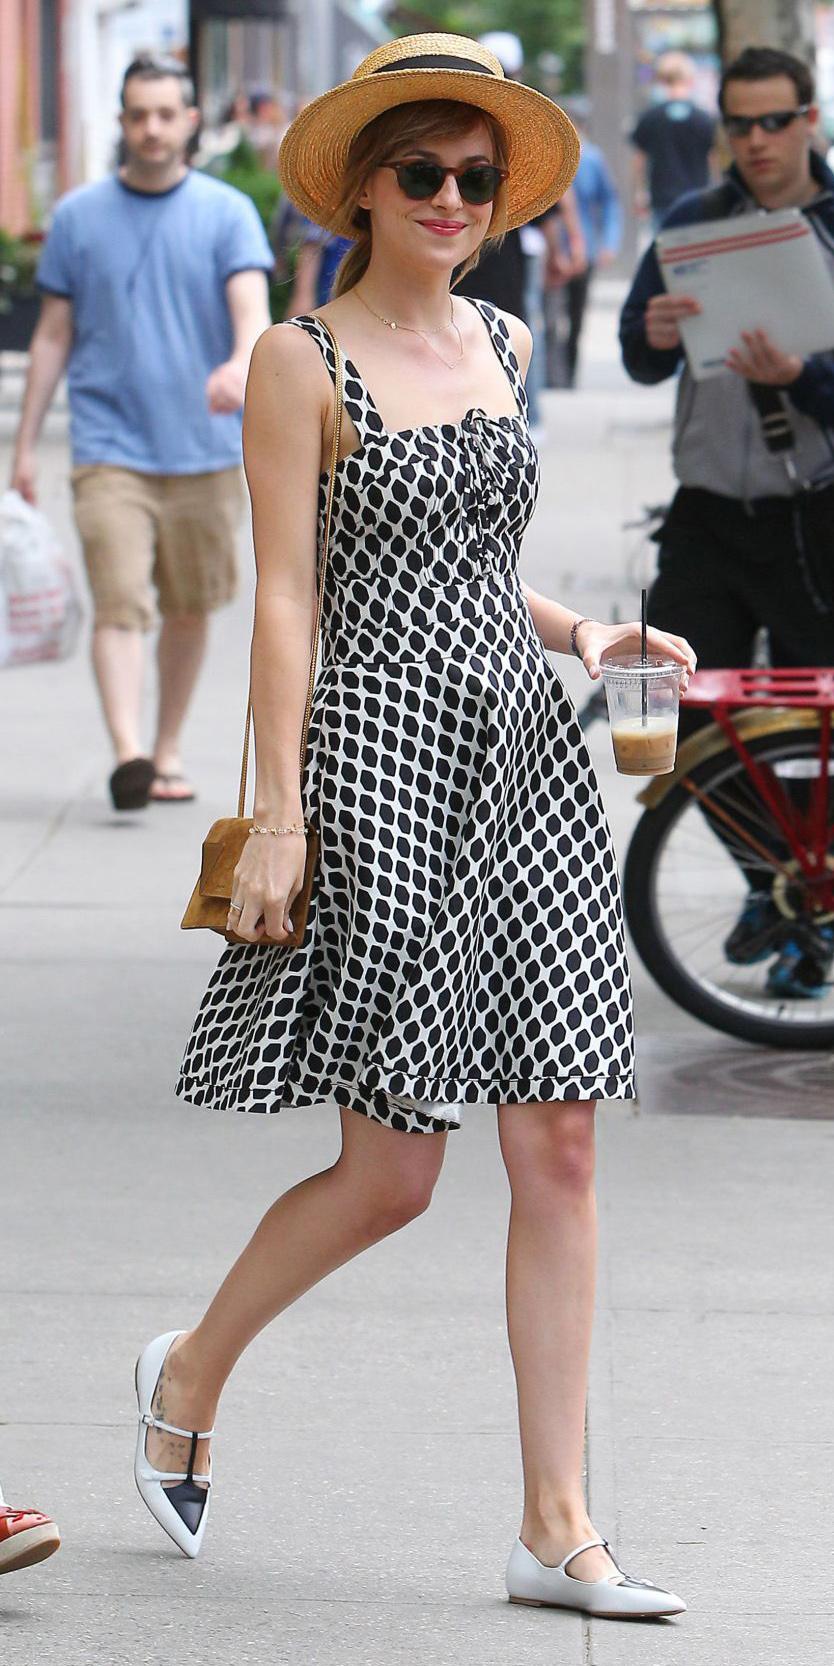 black-dress-tank-hat-straw-sun-pony-white-shoe-flats-print-dakotajohnson-spring-summer-weekend.jpg